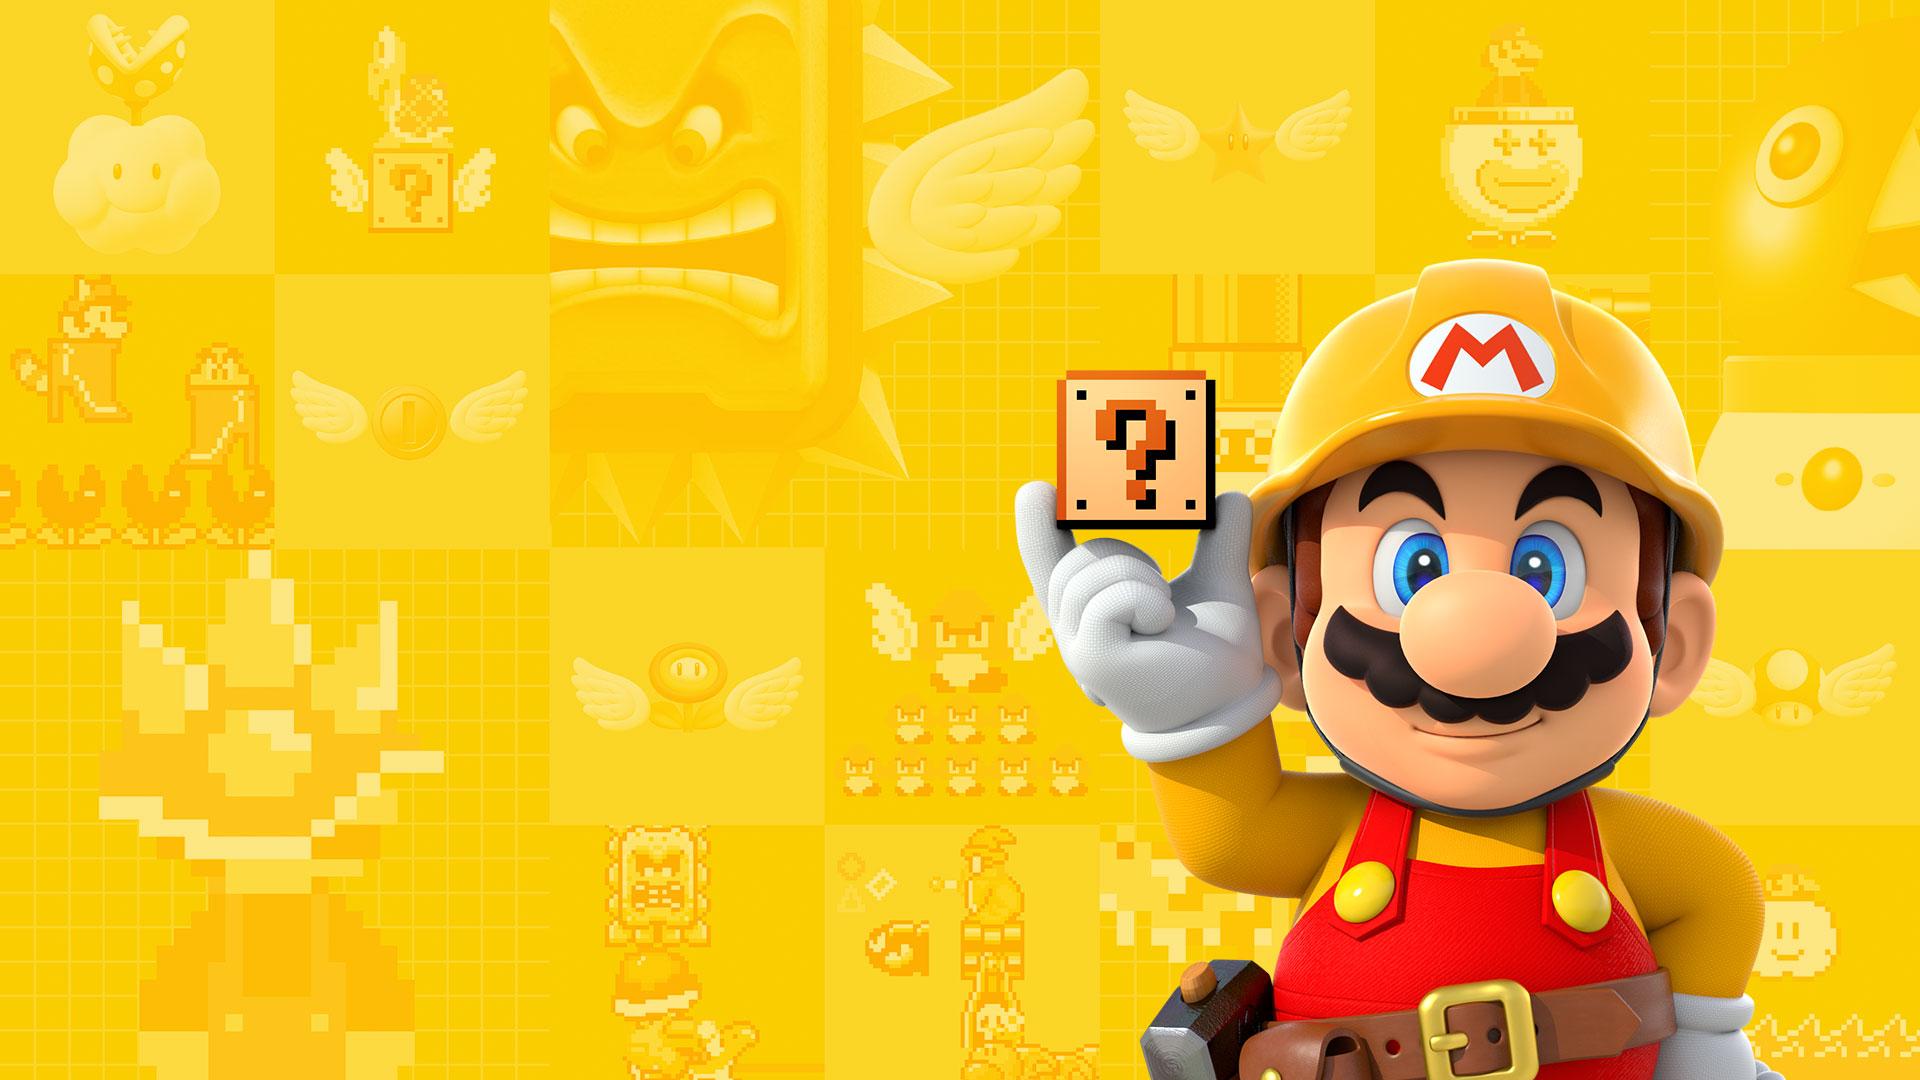 Mickey Mouse 3d Wallpaper Free Super Mario Wallpapers Download Pixelstalk Net